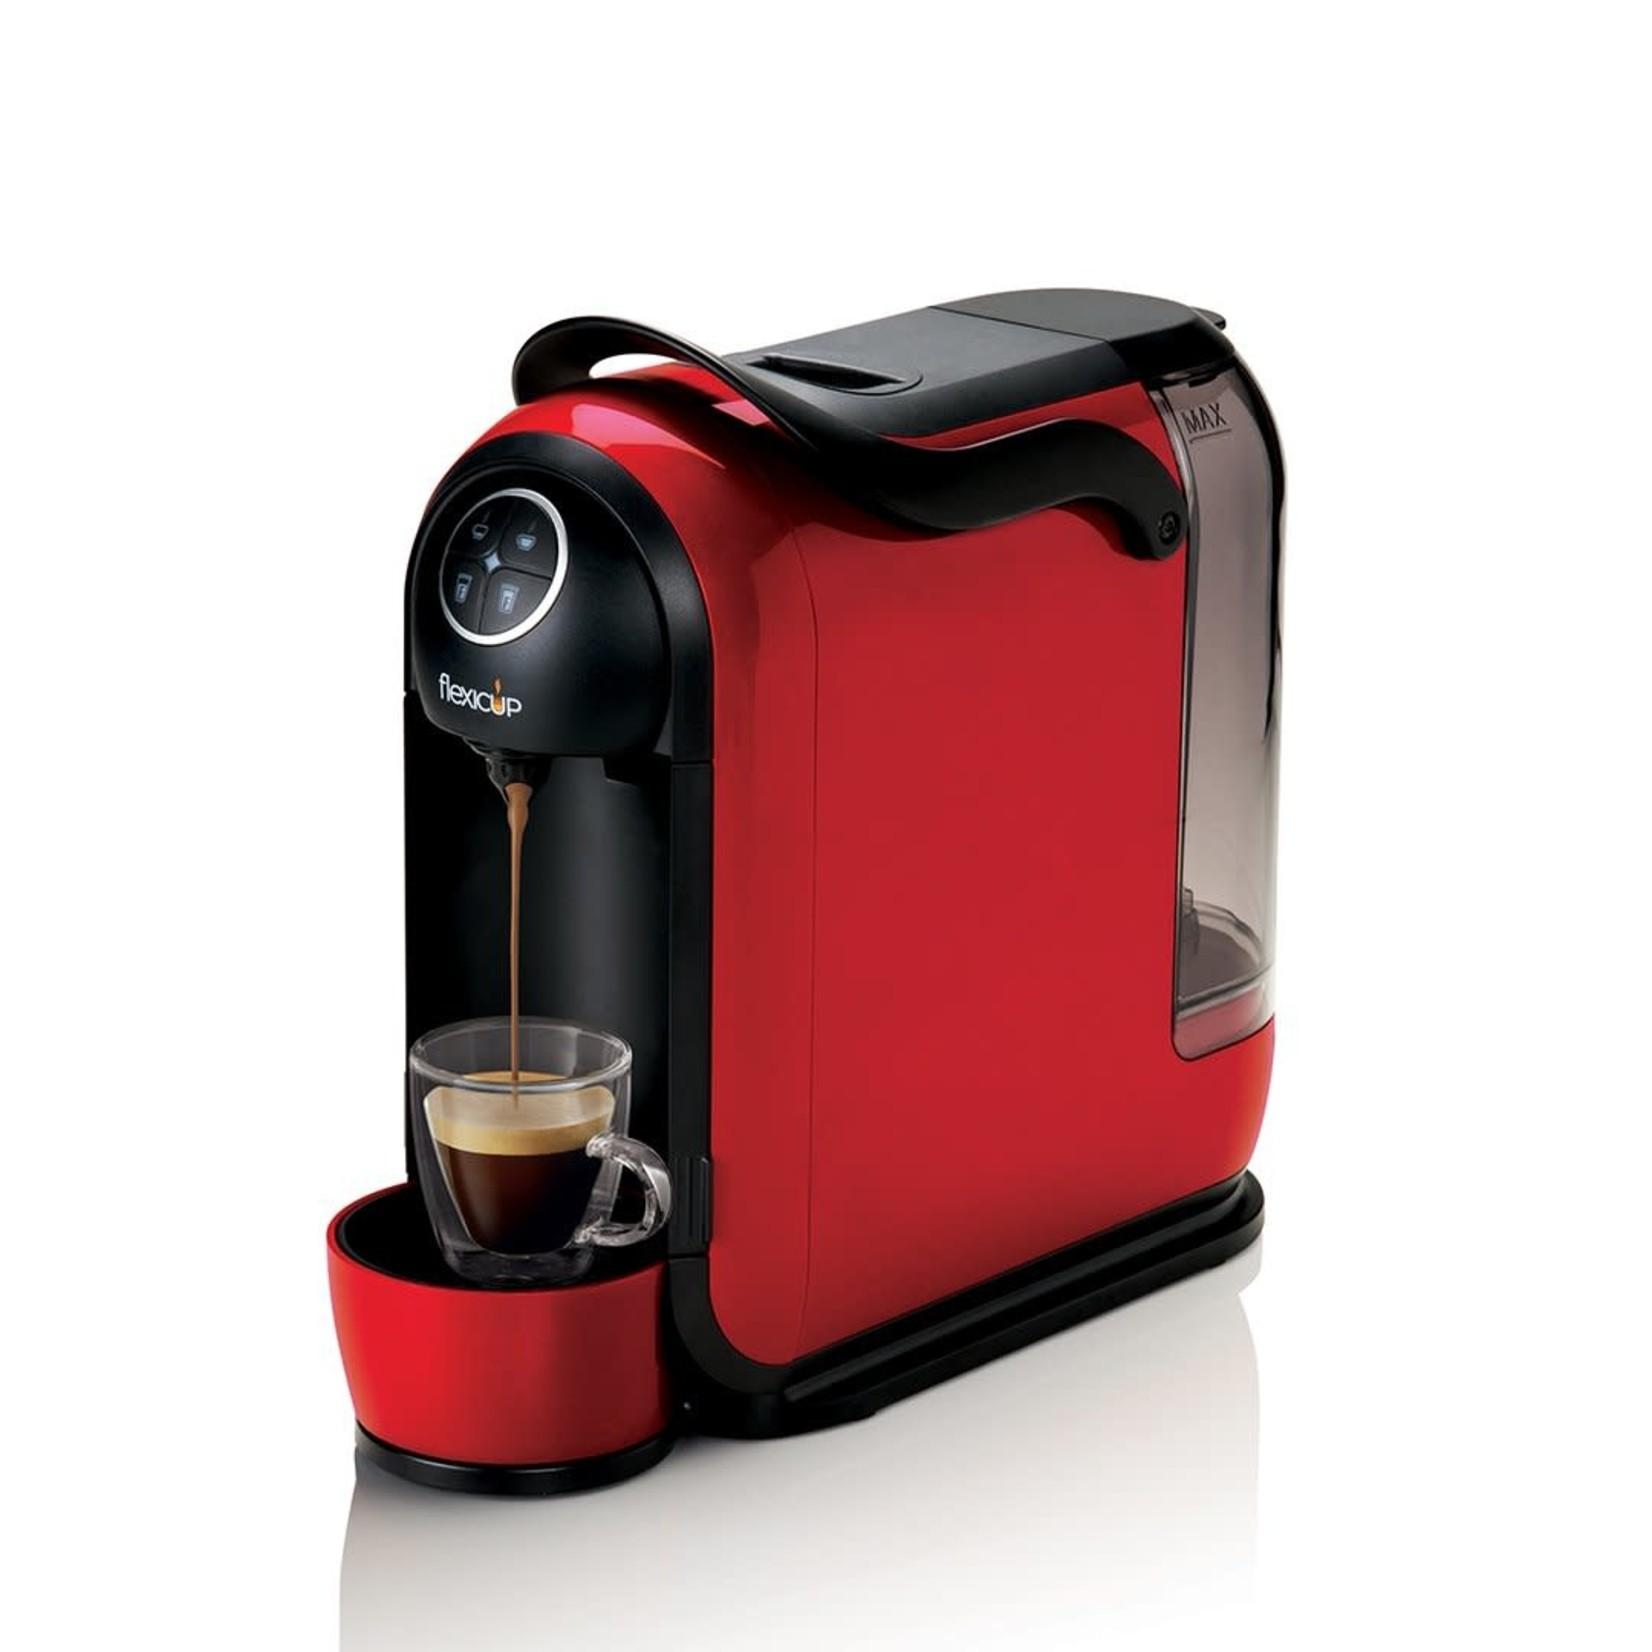 flexicup flexicup M29 Coffee Machine